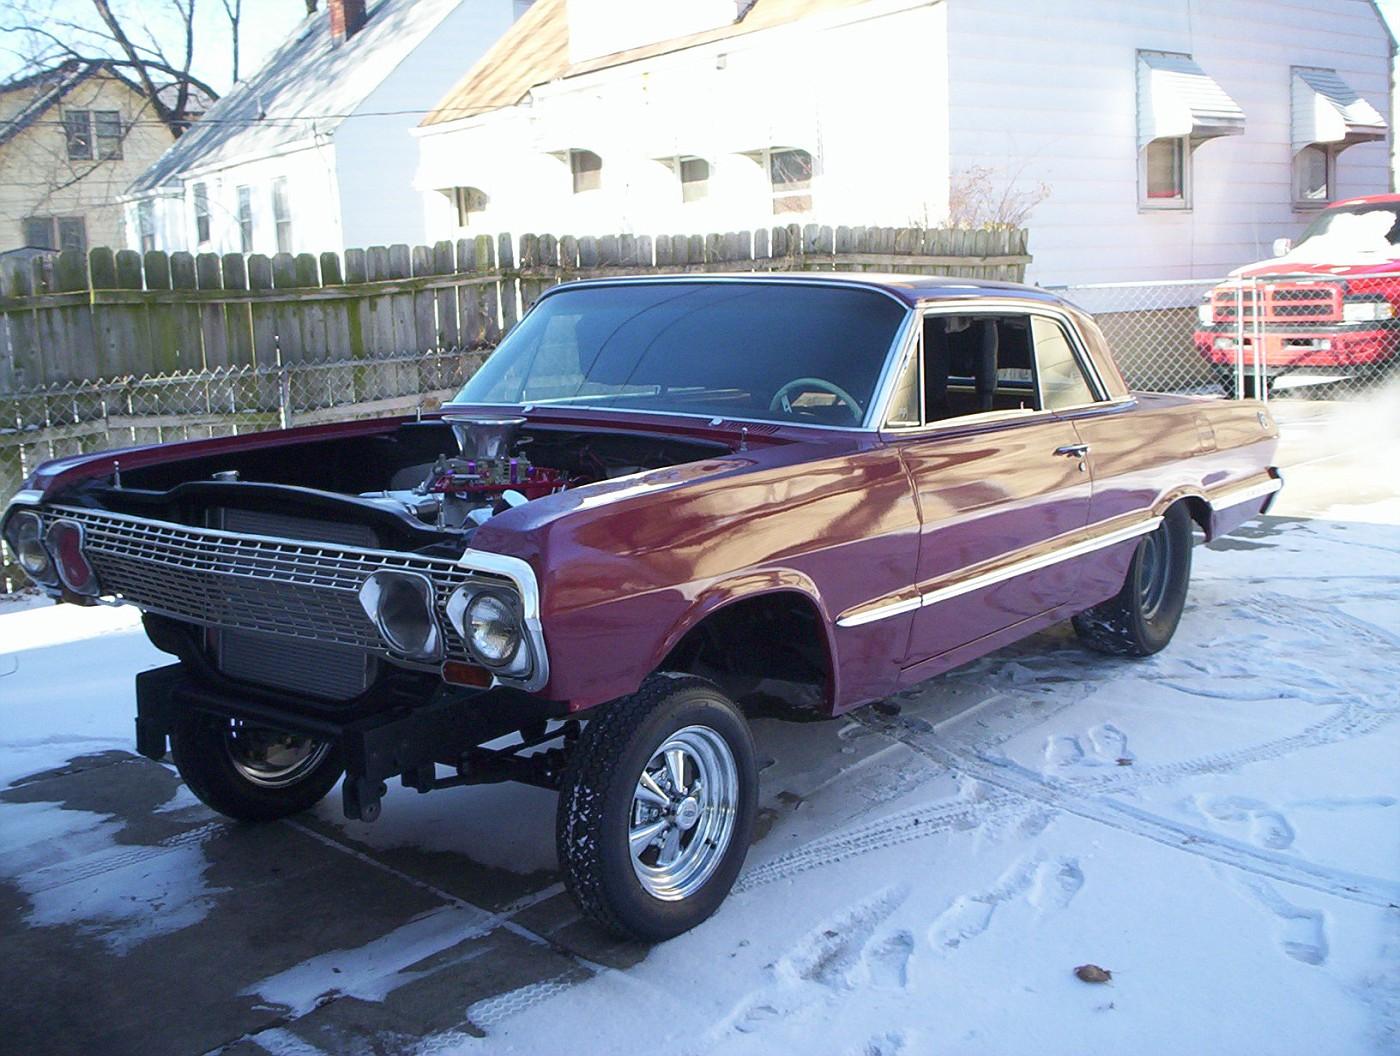 ... 02 chevy impala on 24 s w custom paint and suicide lambo doors